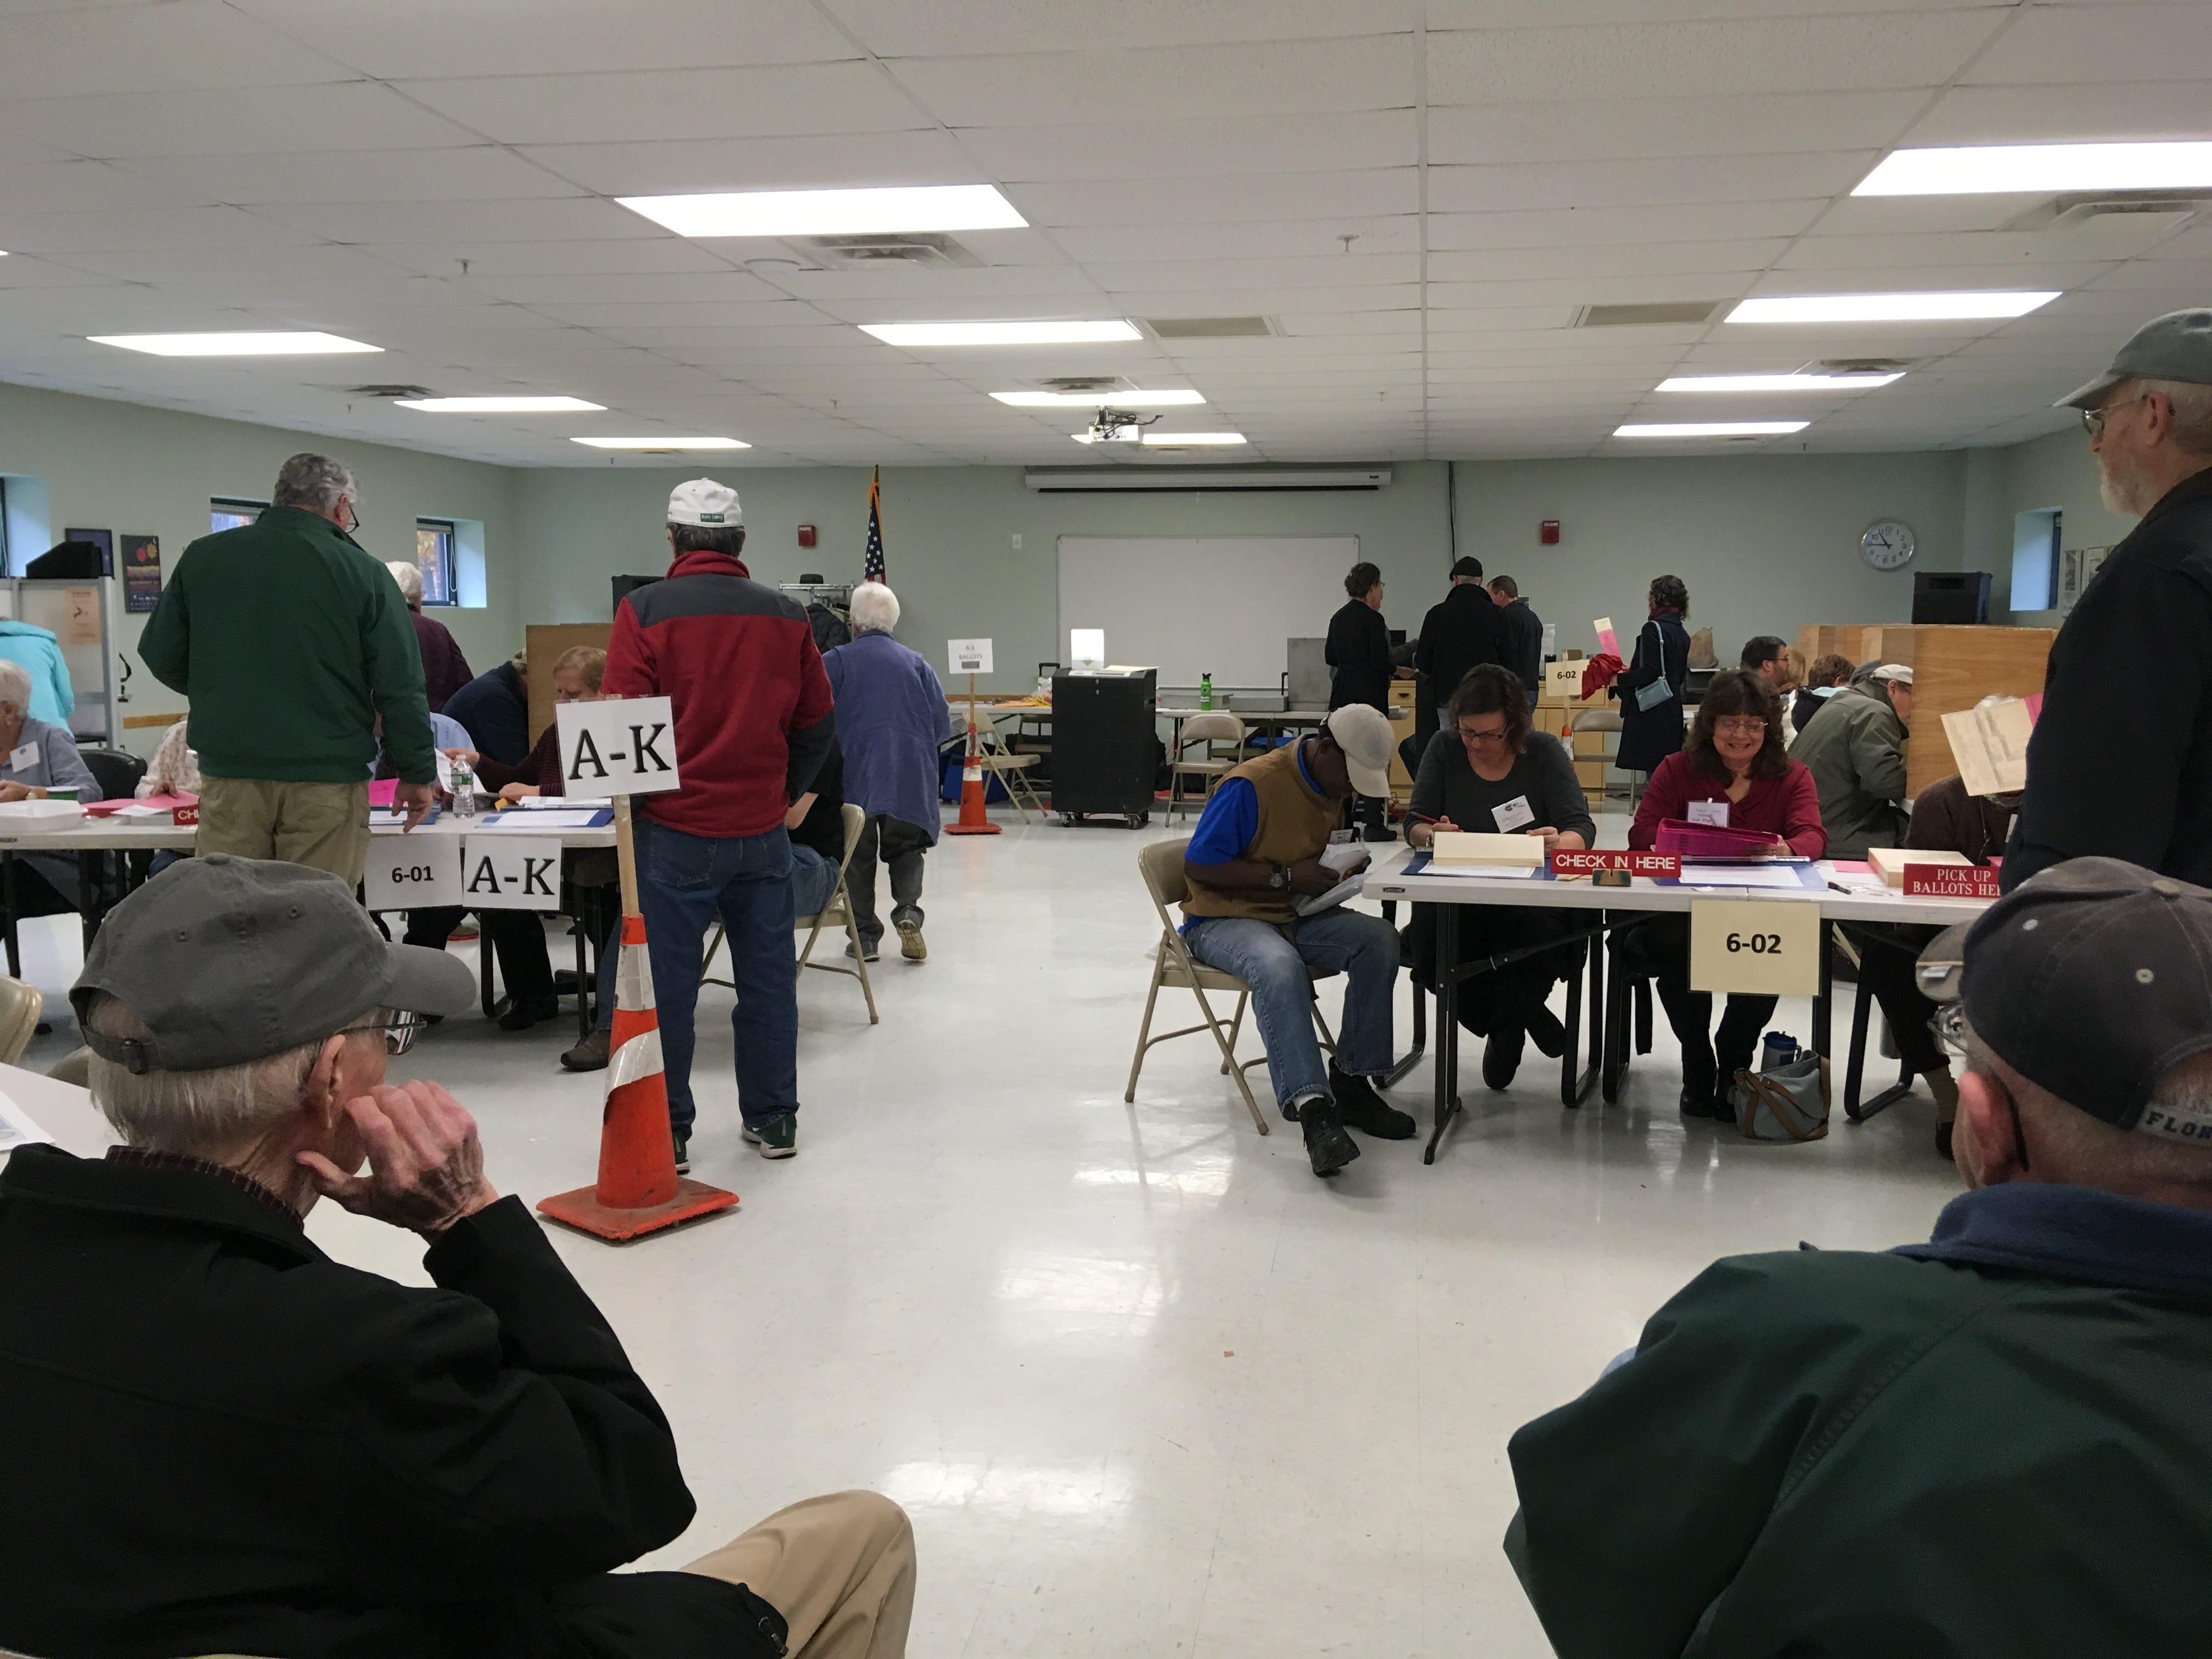 Burlington's Ward 7 polling location at the Robert Miller Recreation Center seen on the morning of Nov. 6, 2018.